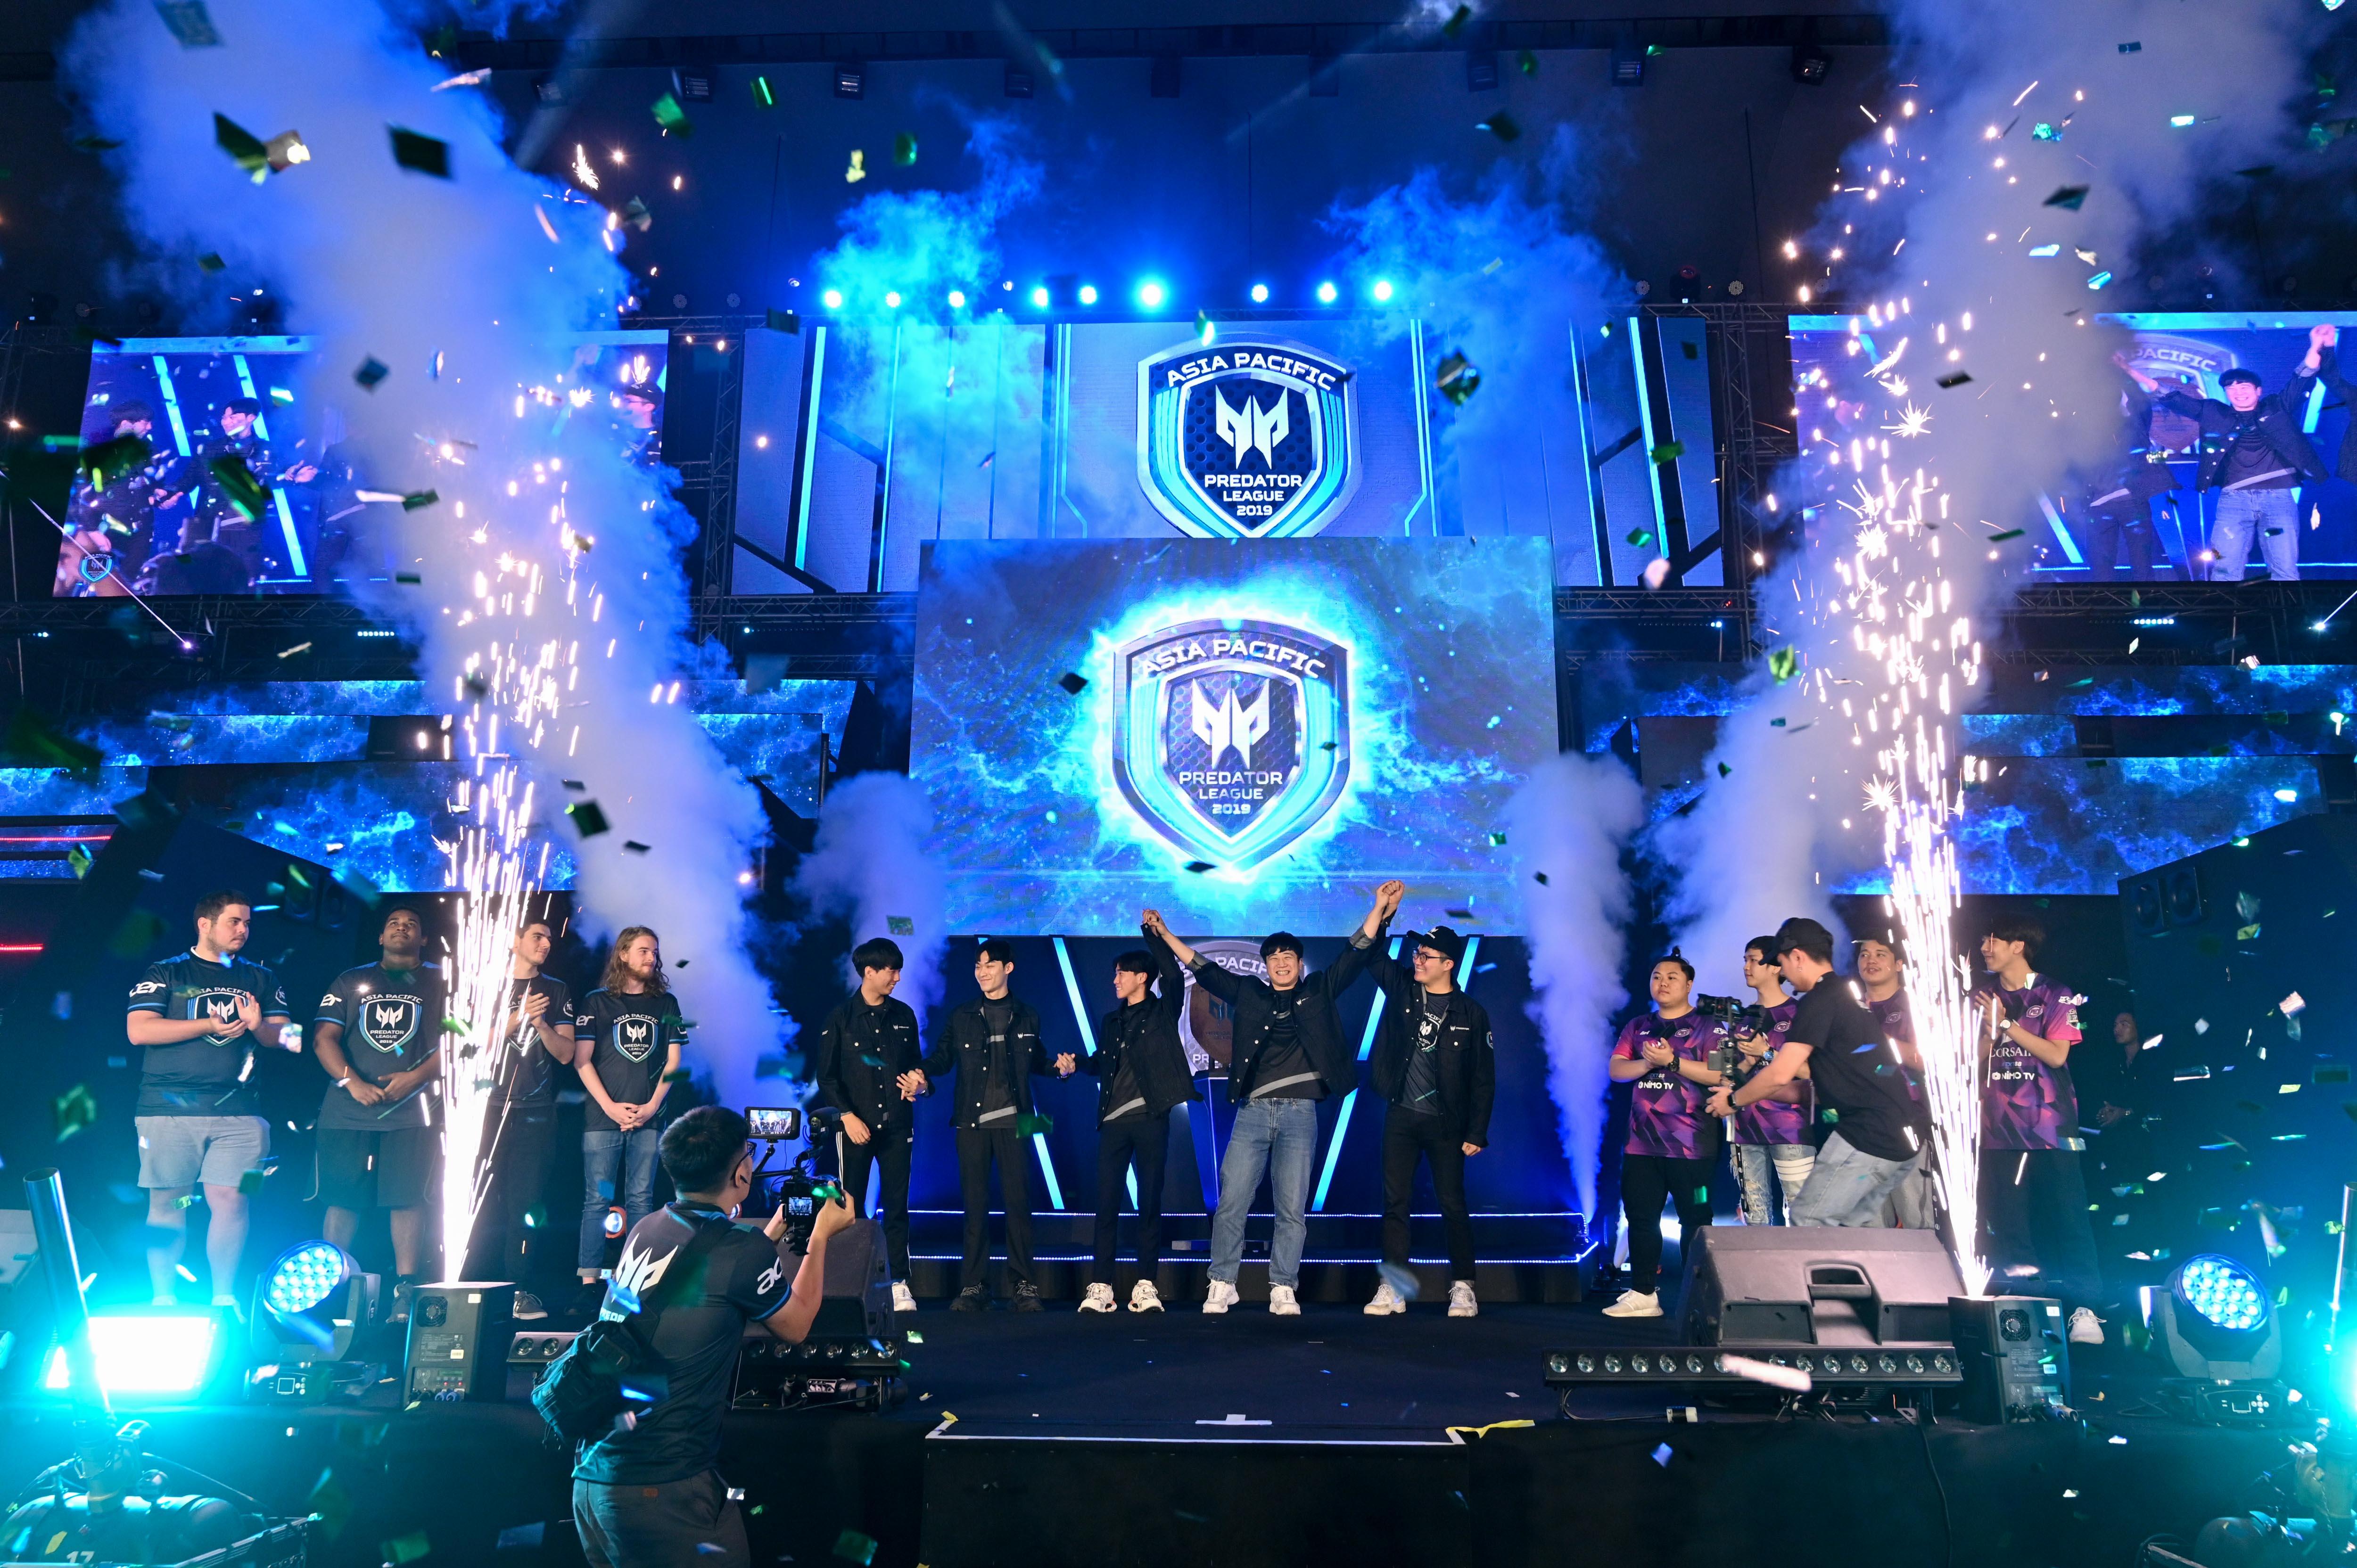 01 dsc 3482 17 02 19 บรรยากาศงาน Asia Pacific Predator League 2019 สุดยอดขุนพลทีมอีสปอร์ตเข้าร่วมการแข่งขันรอบแกรนด์ไฟนอล